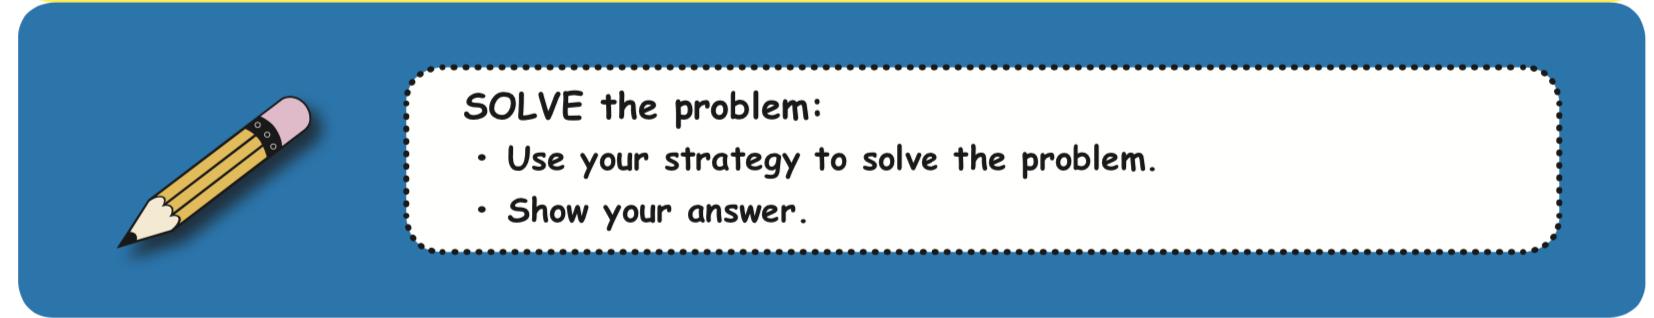 solve the problem